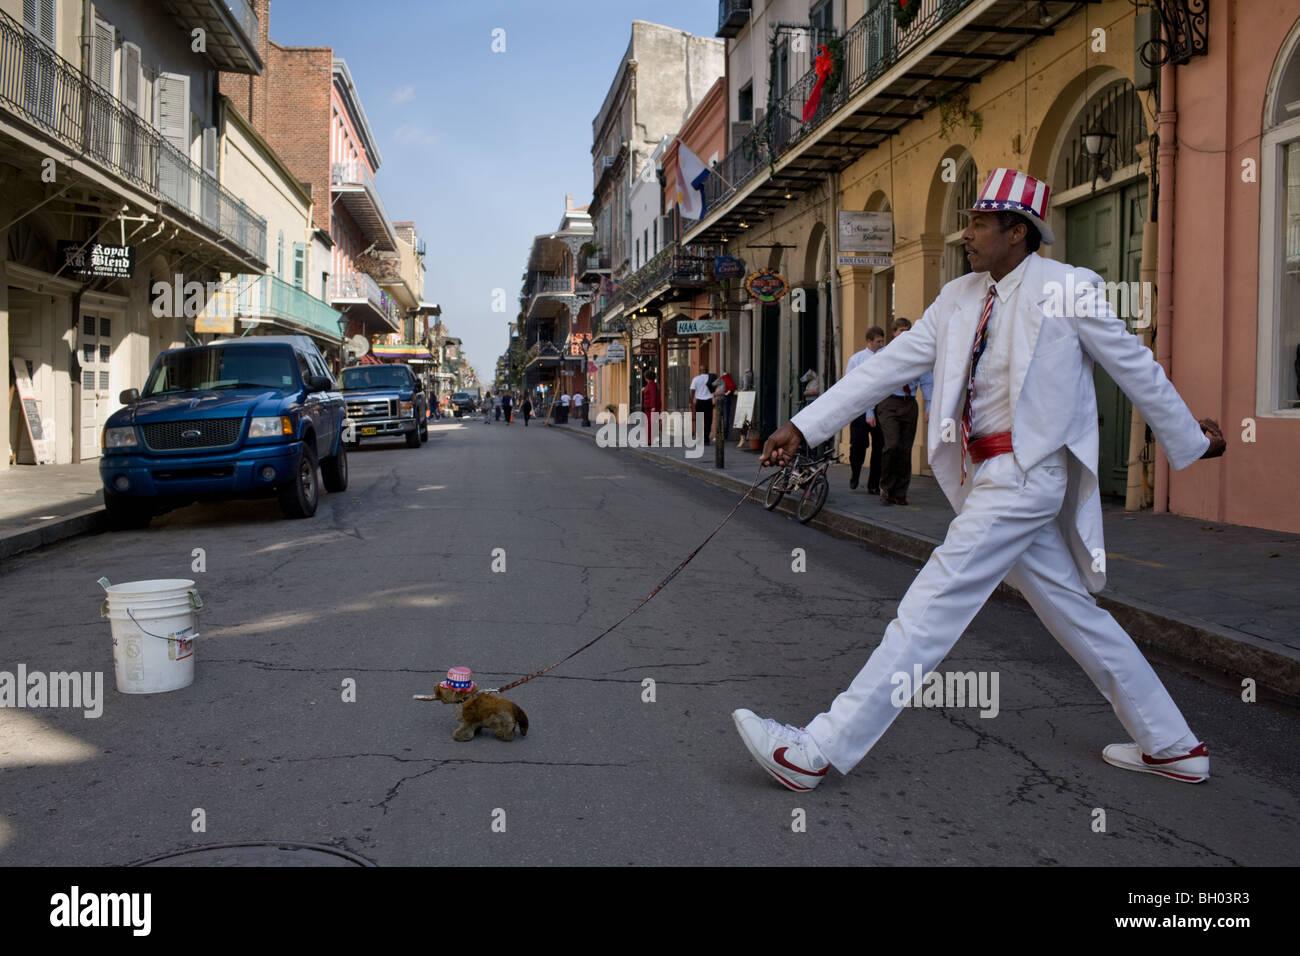 A mime street performer entertains, Bourbon Street, French Quarter, New Orleans, Louisiana Stock Photo